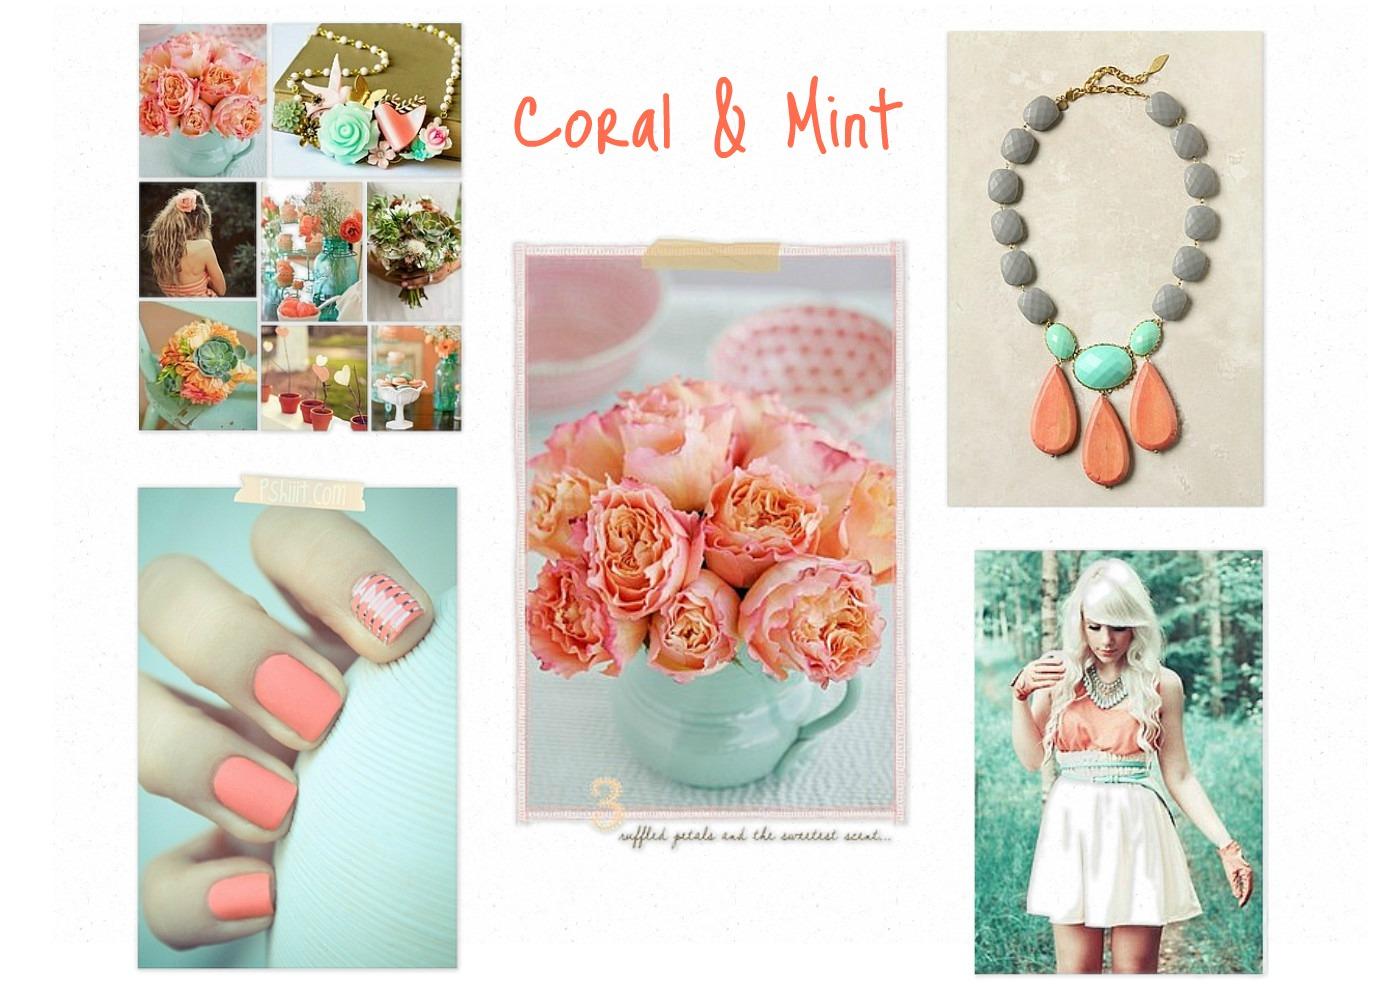 My Best Friend's Blog: Coral & Mint